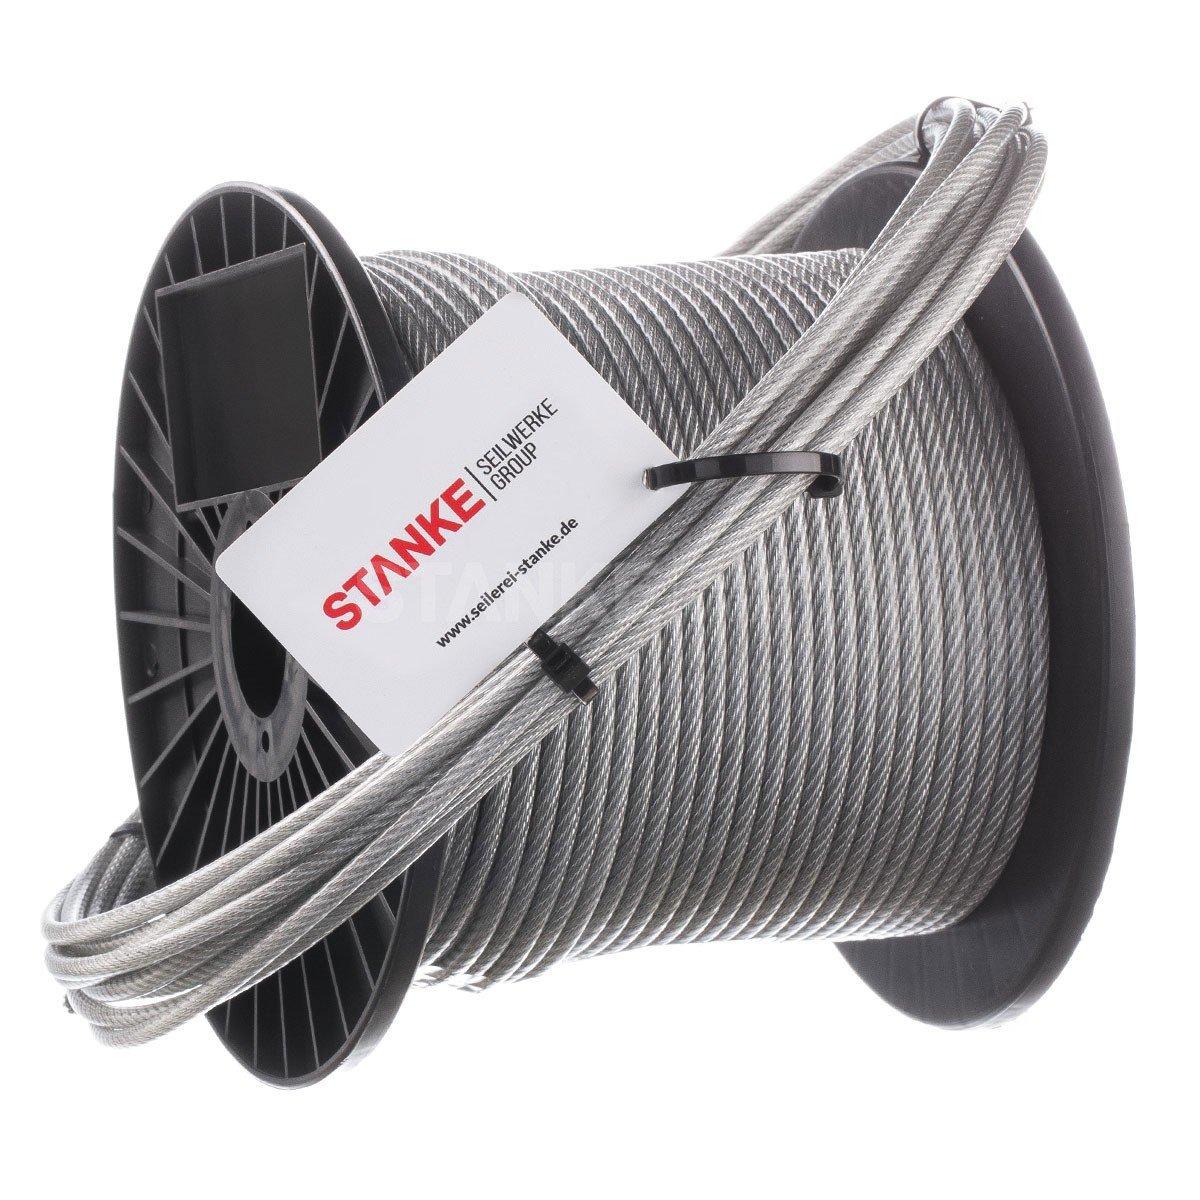 Stahlseil 2mm PVC ummantelt | Jumbo-Shop